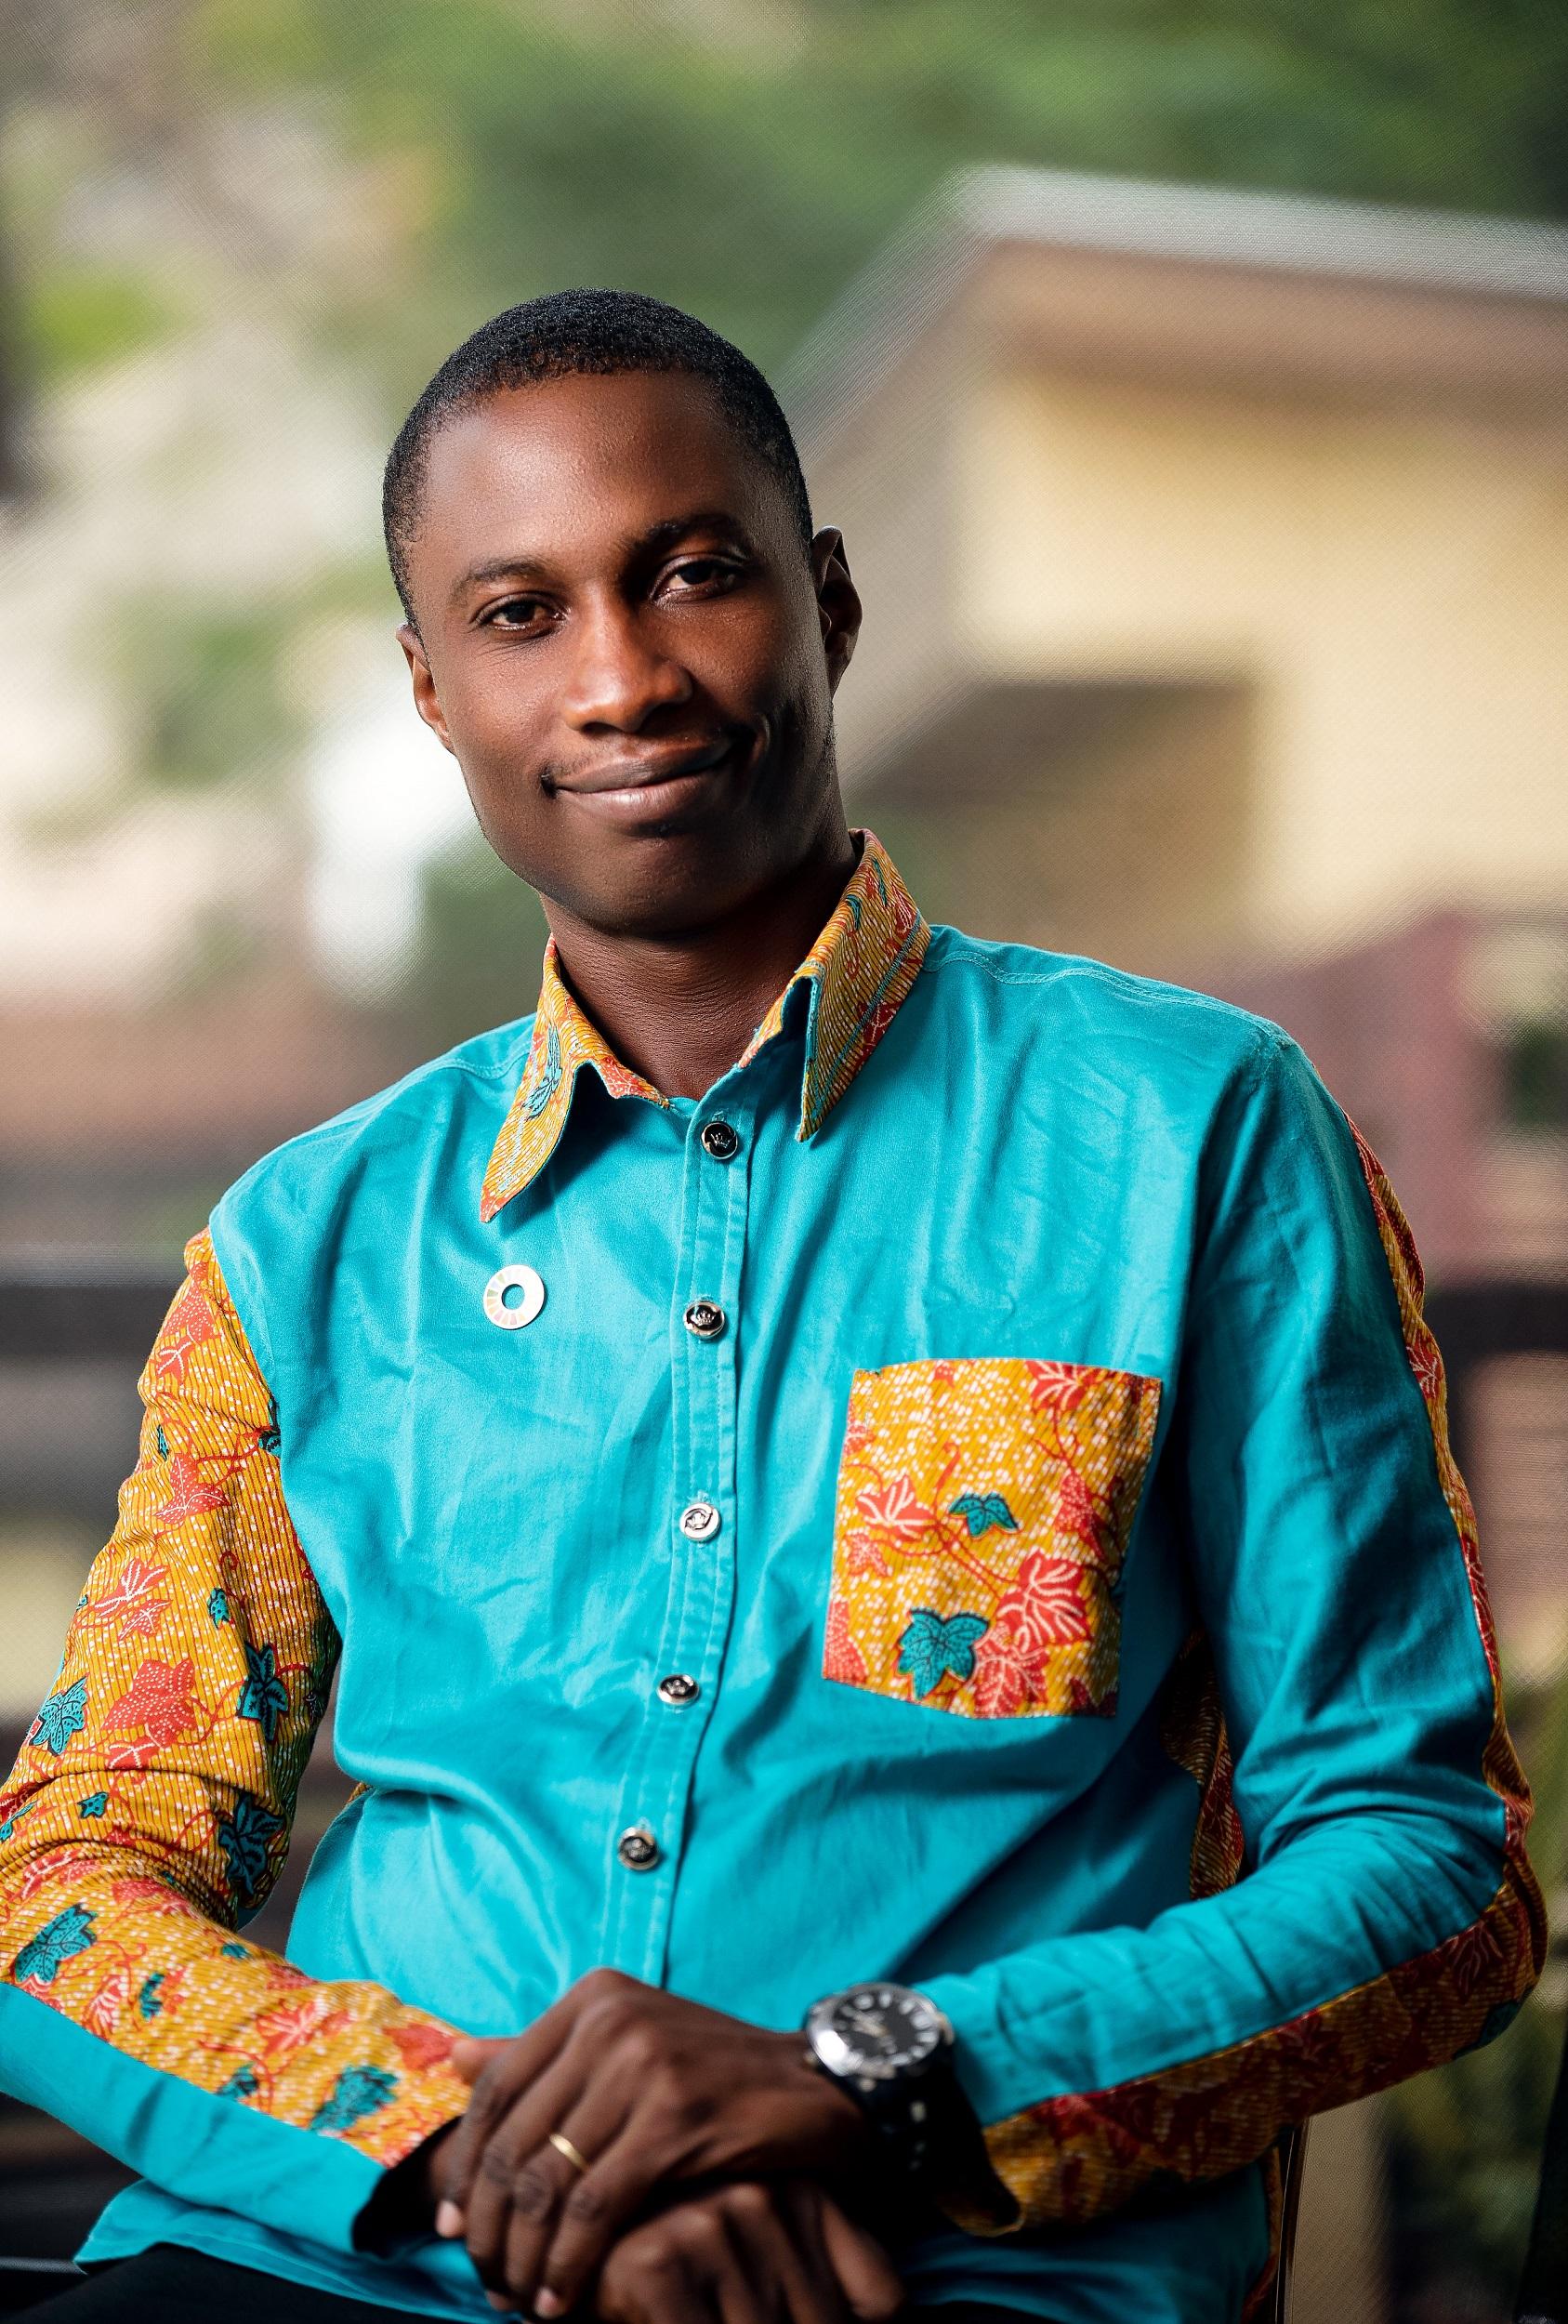 Chibeze Ezekiel, the 2020 Goldman Environmental Prize winner for Africa. Image courtesy of Goldman Environmental Prize.